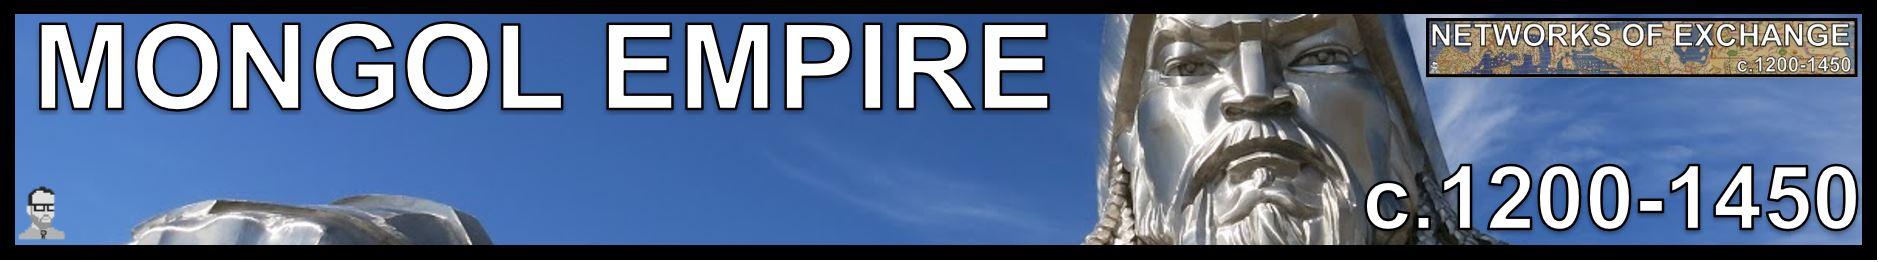 2.2 MONGOL EMPIRE NETWORKS OF EXCHANGE FREEMANPEDIA AP WORLD MODERN.JPG